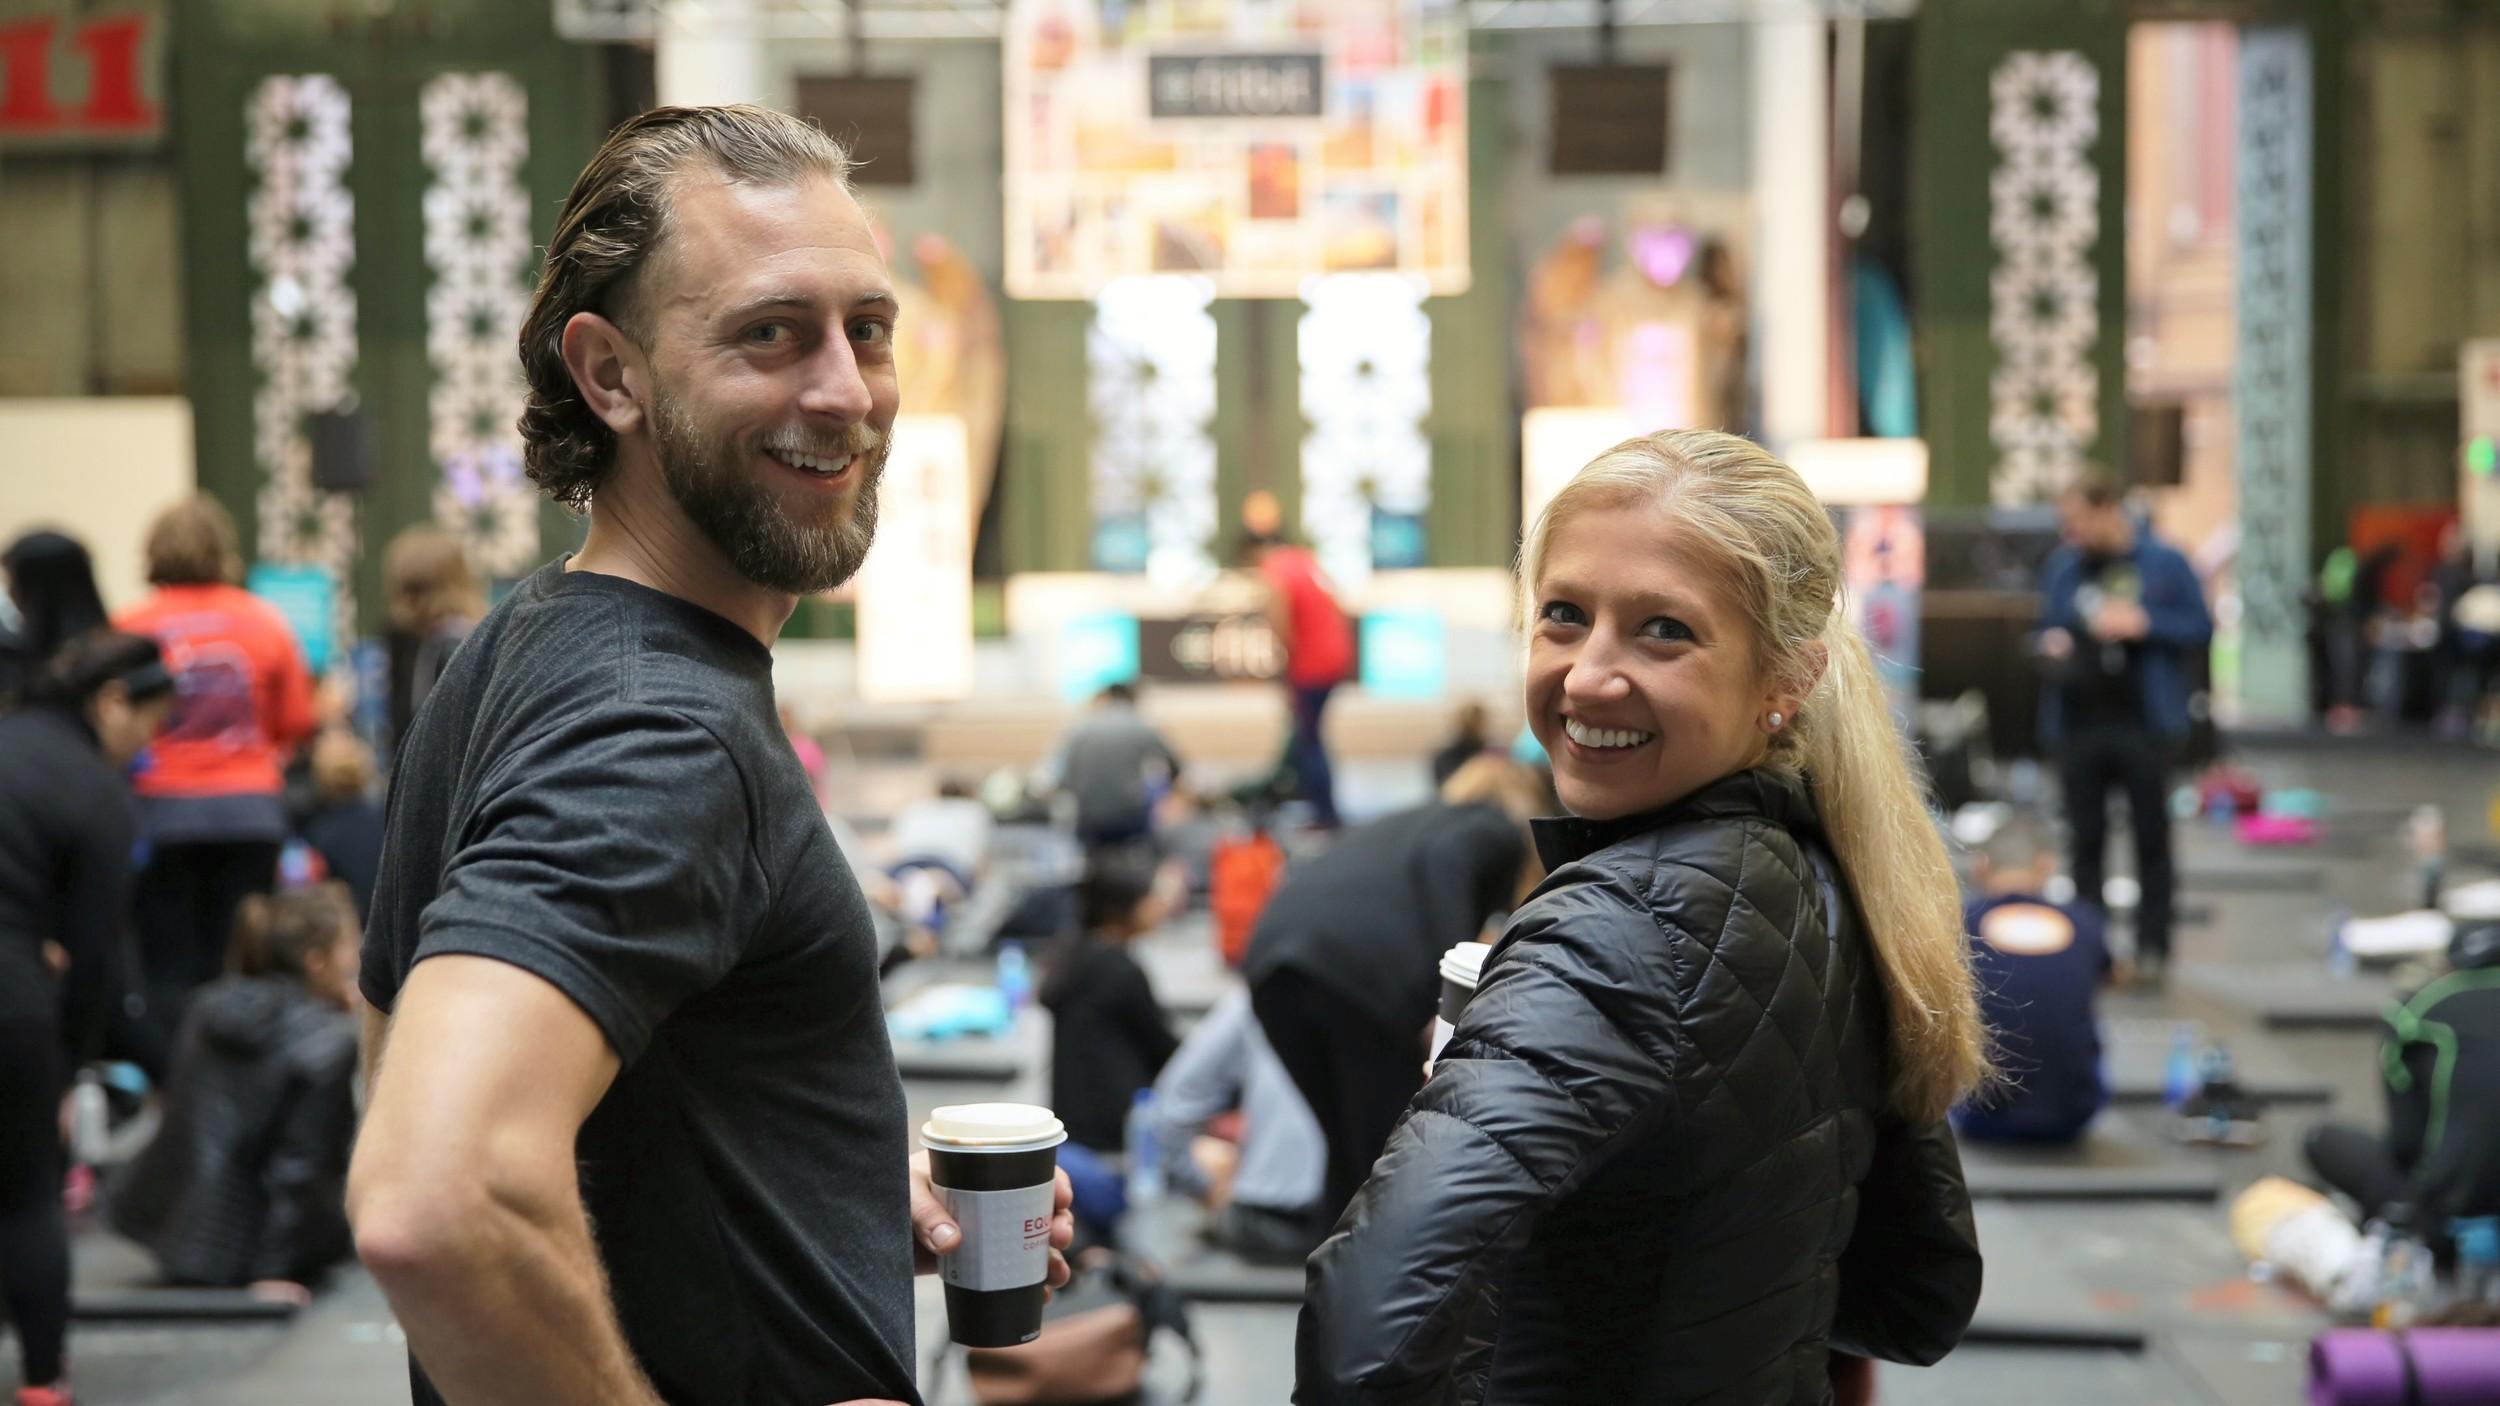 Jeremy Falk and Caroline Jordan are the Fitbit Local ambassadors in San Francisco.